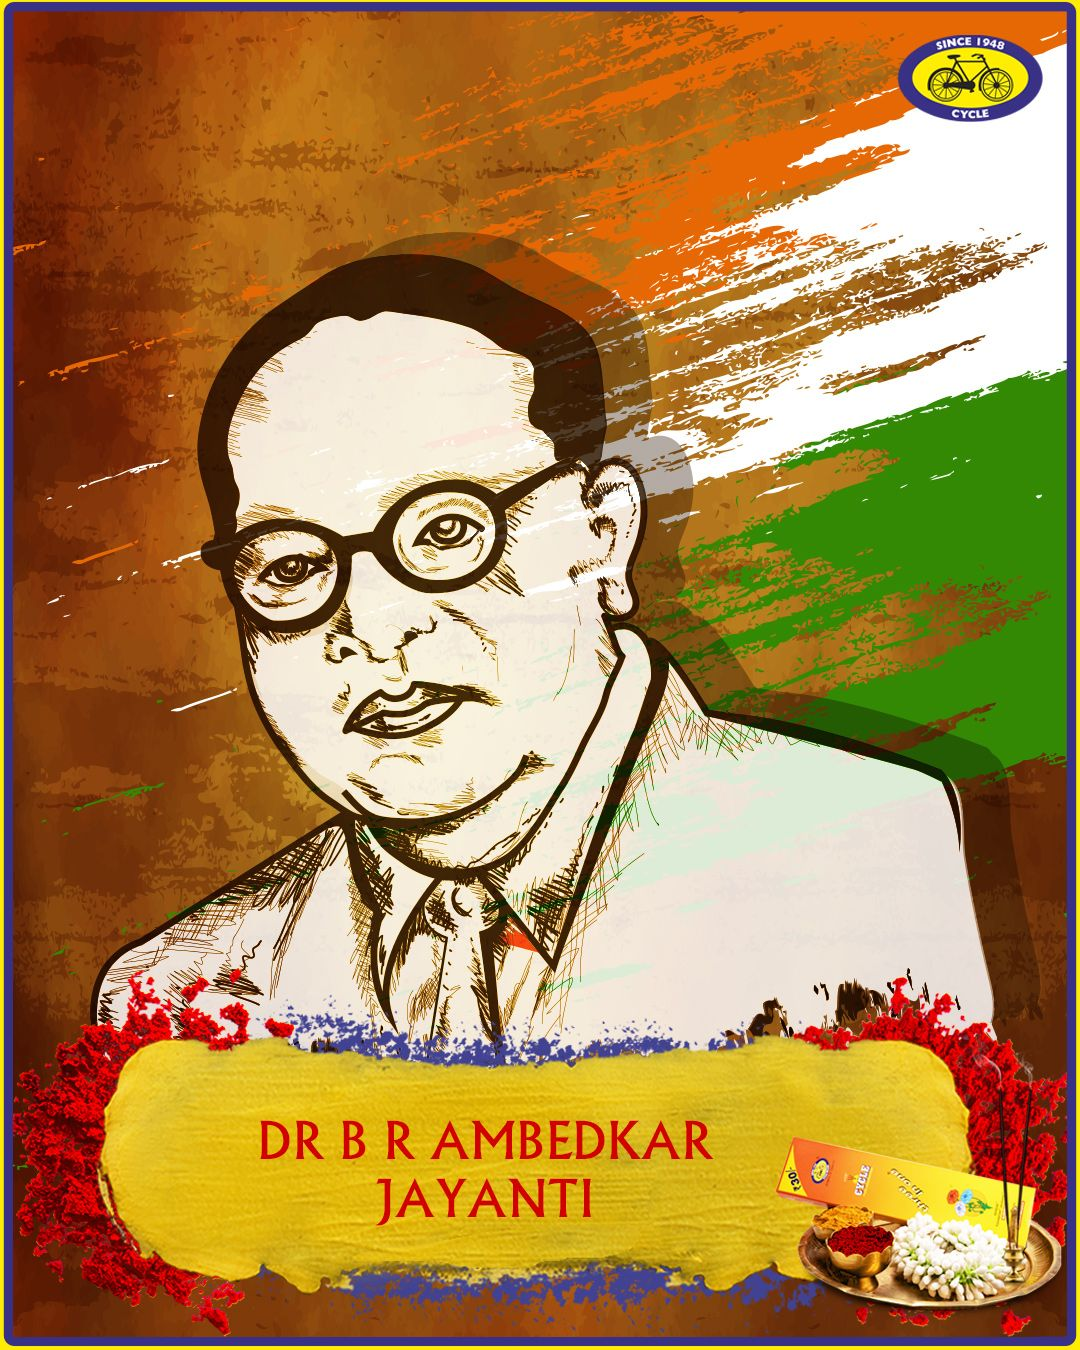 Dr. Bhimrao Ramji Ambedkar was born on 14 April, 1891. He